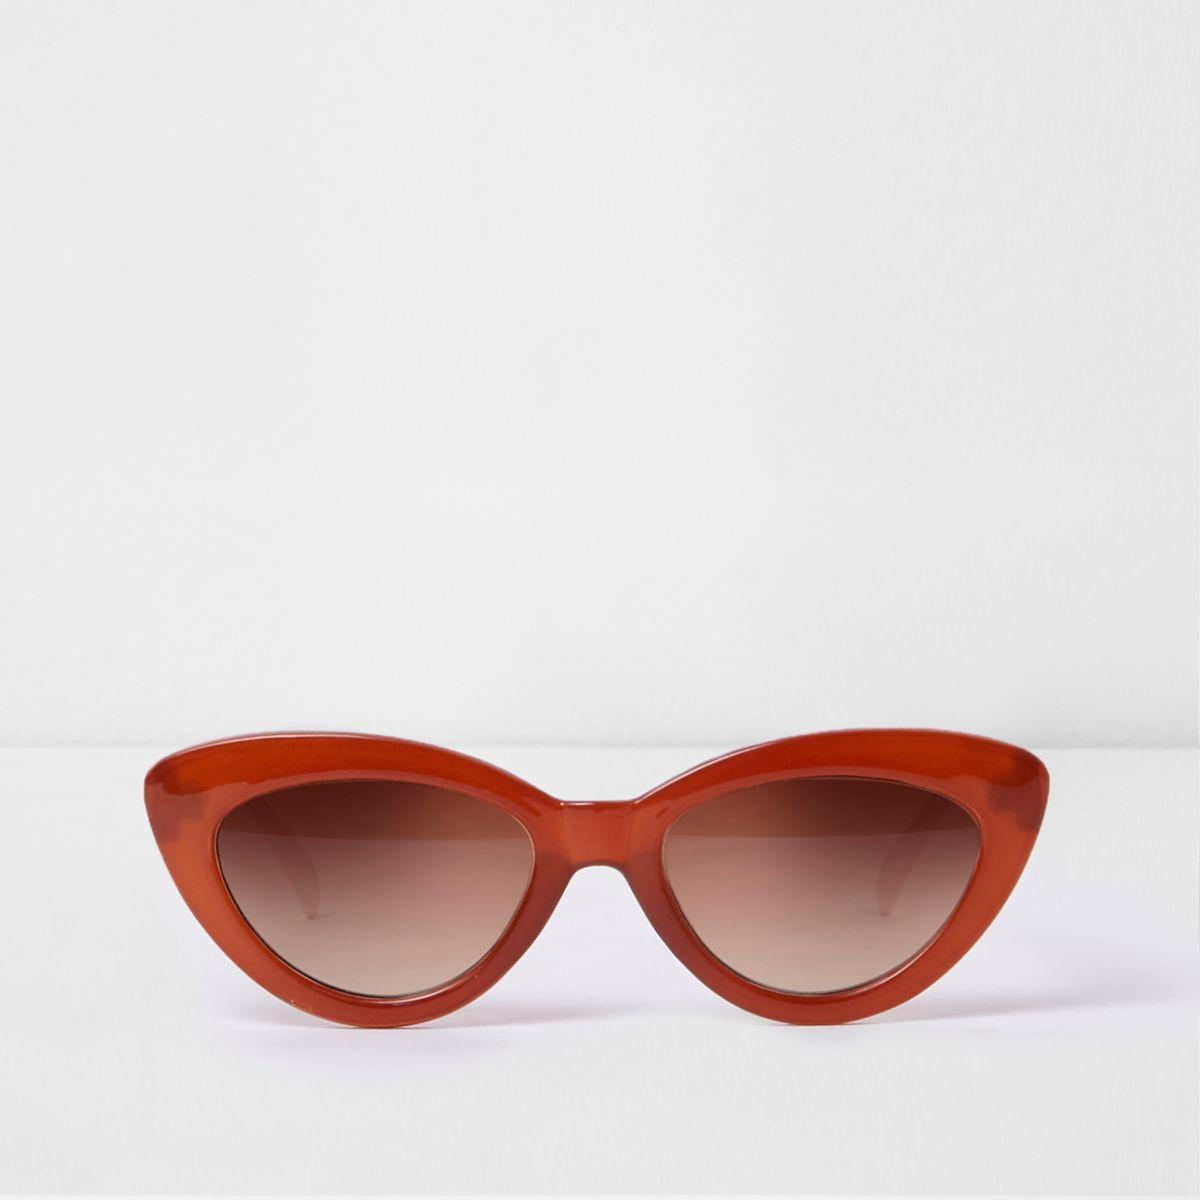 Dark orange cat eye tinted lens sunglasses